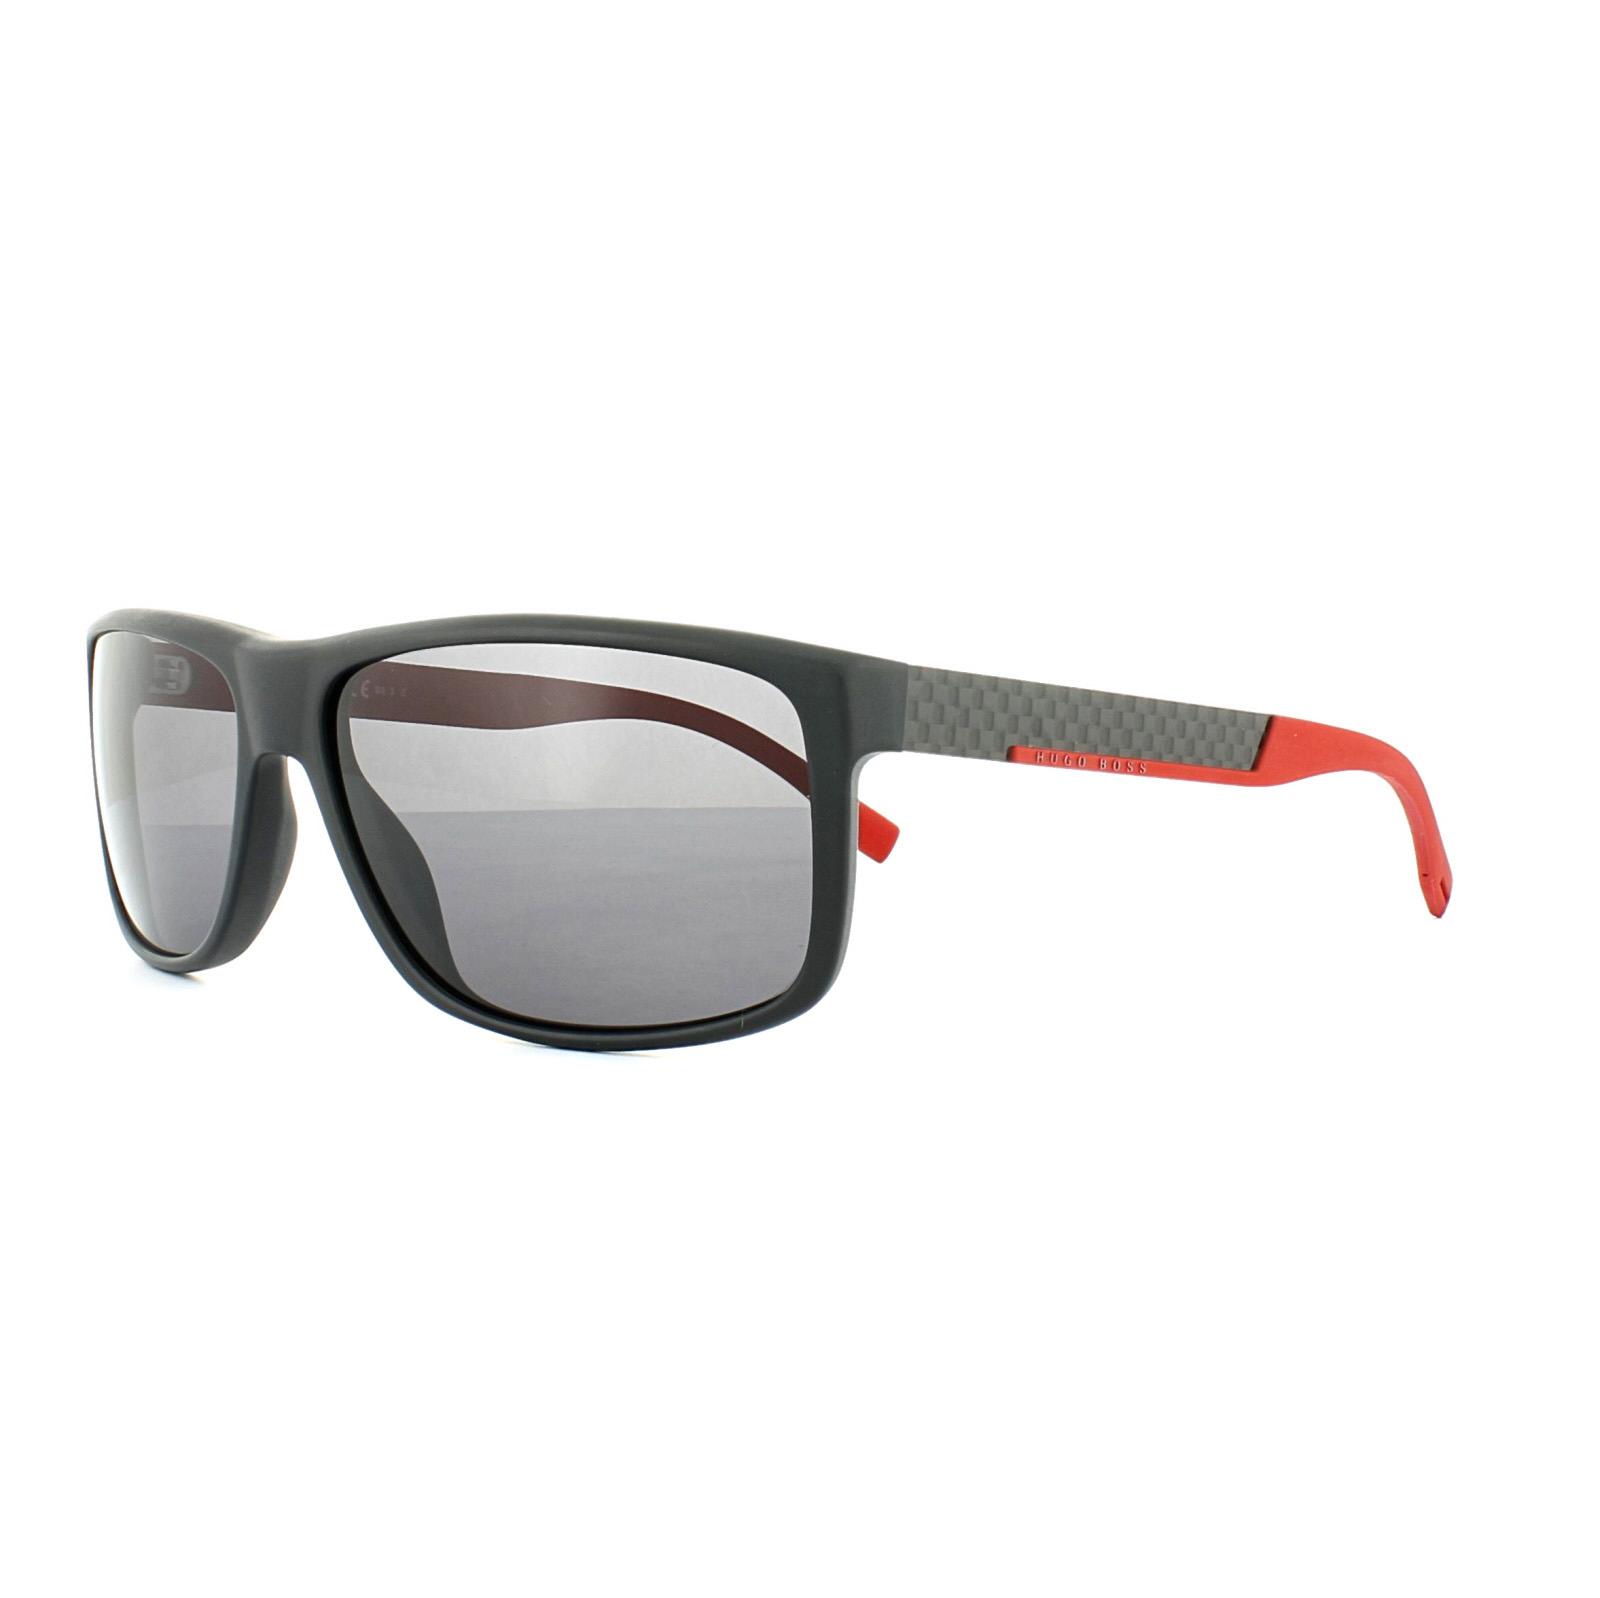 Boss Herren Sonnenbrille » BOSS 0637/S«, schwarz, HXA/3H - schwarz/grau